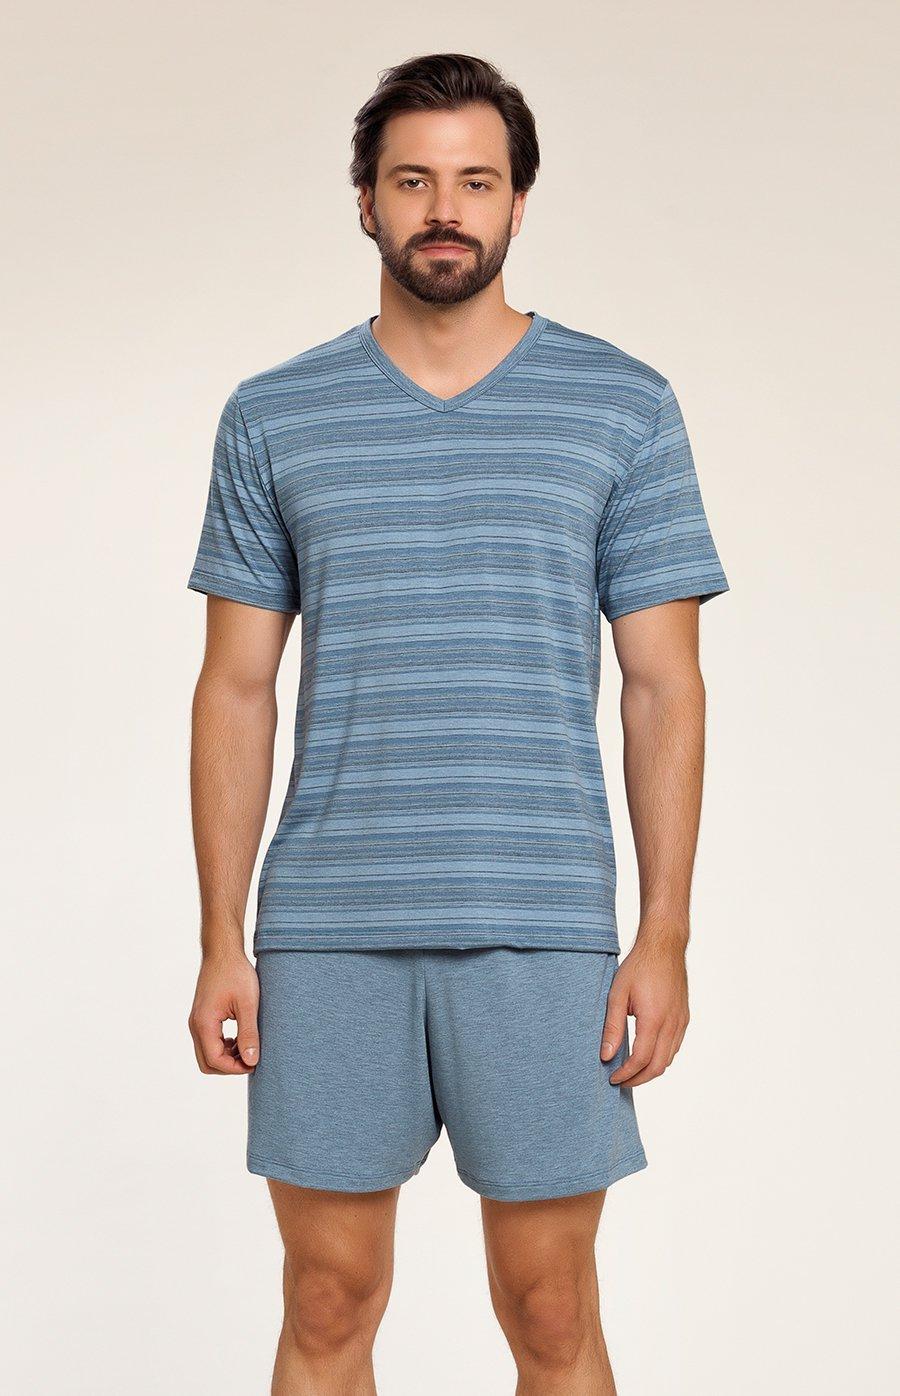 Pijama Clássico Verão 2020 MIAMI DREAMS